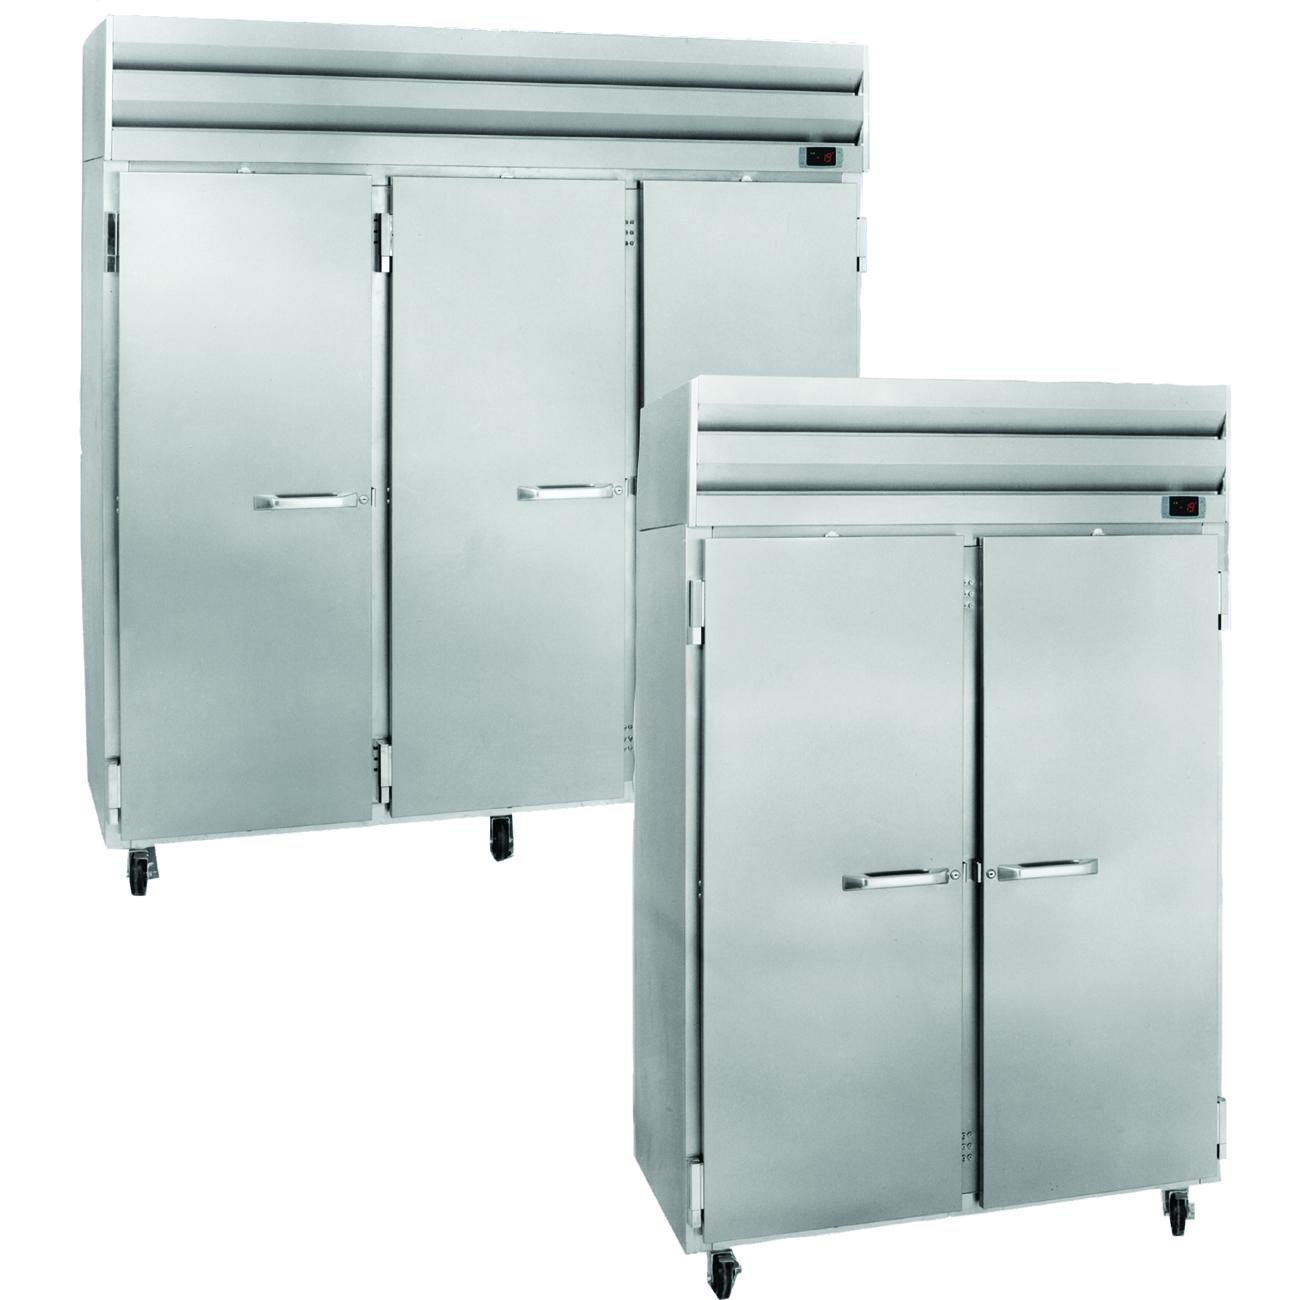 Howard-McCray R-SR75 refrigerator, reach-in